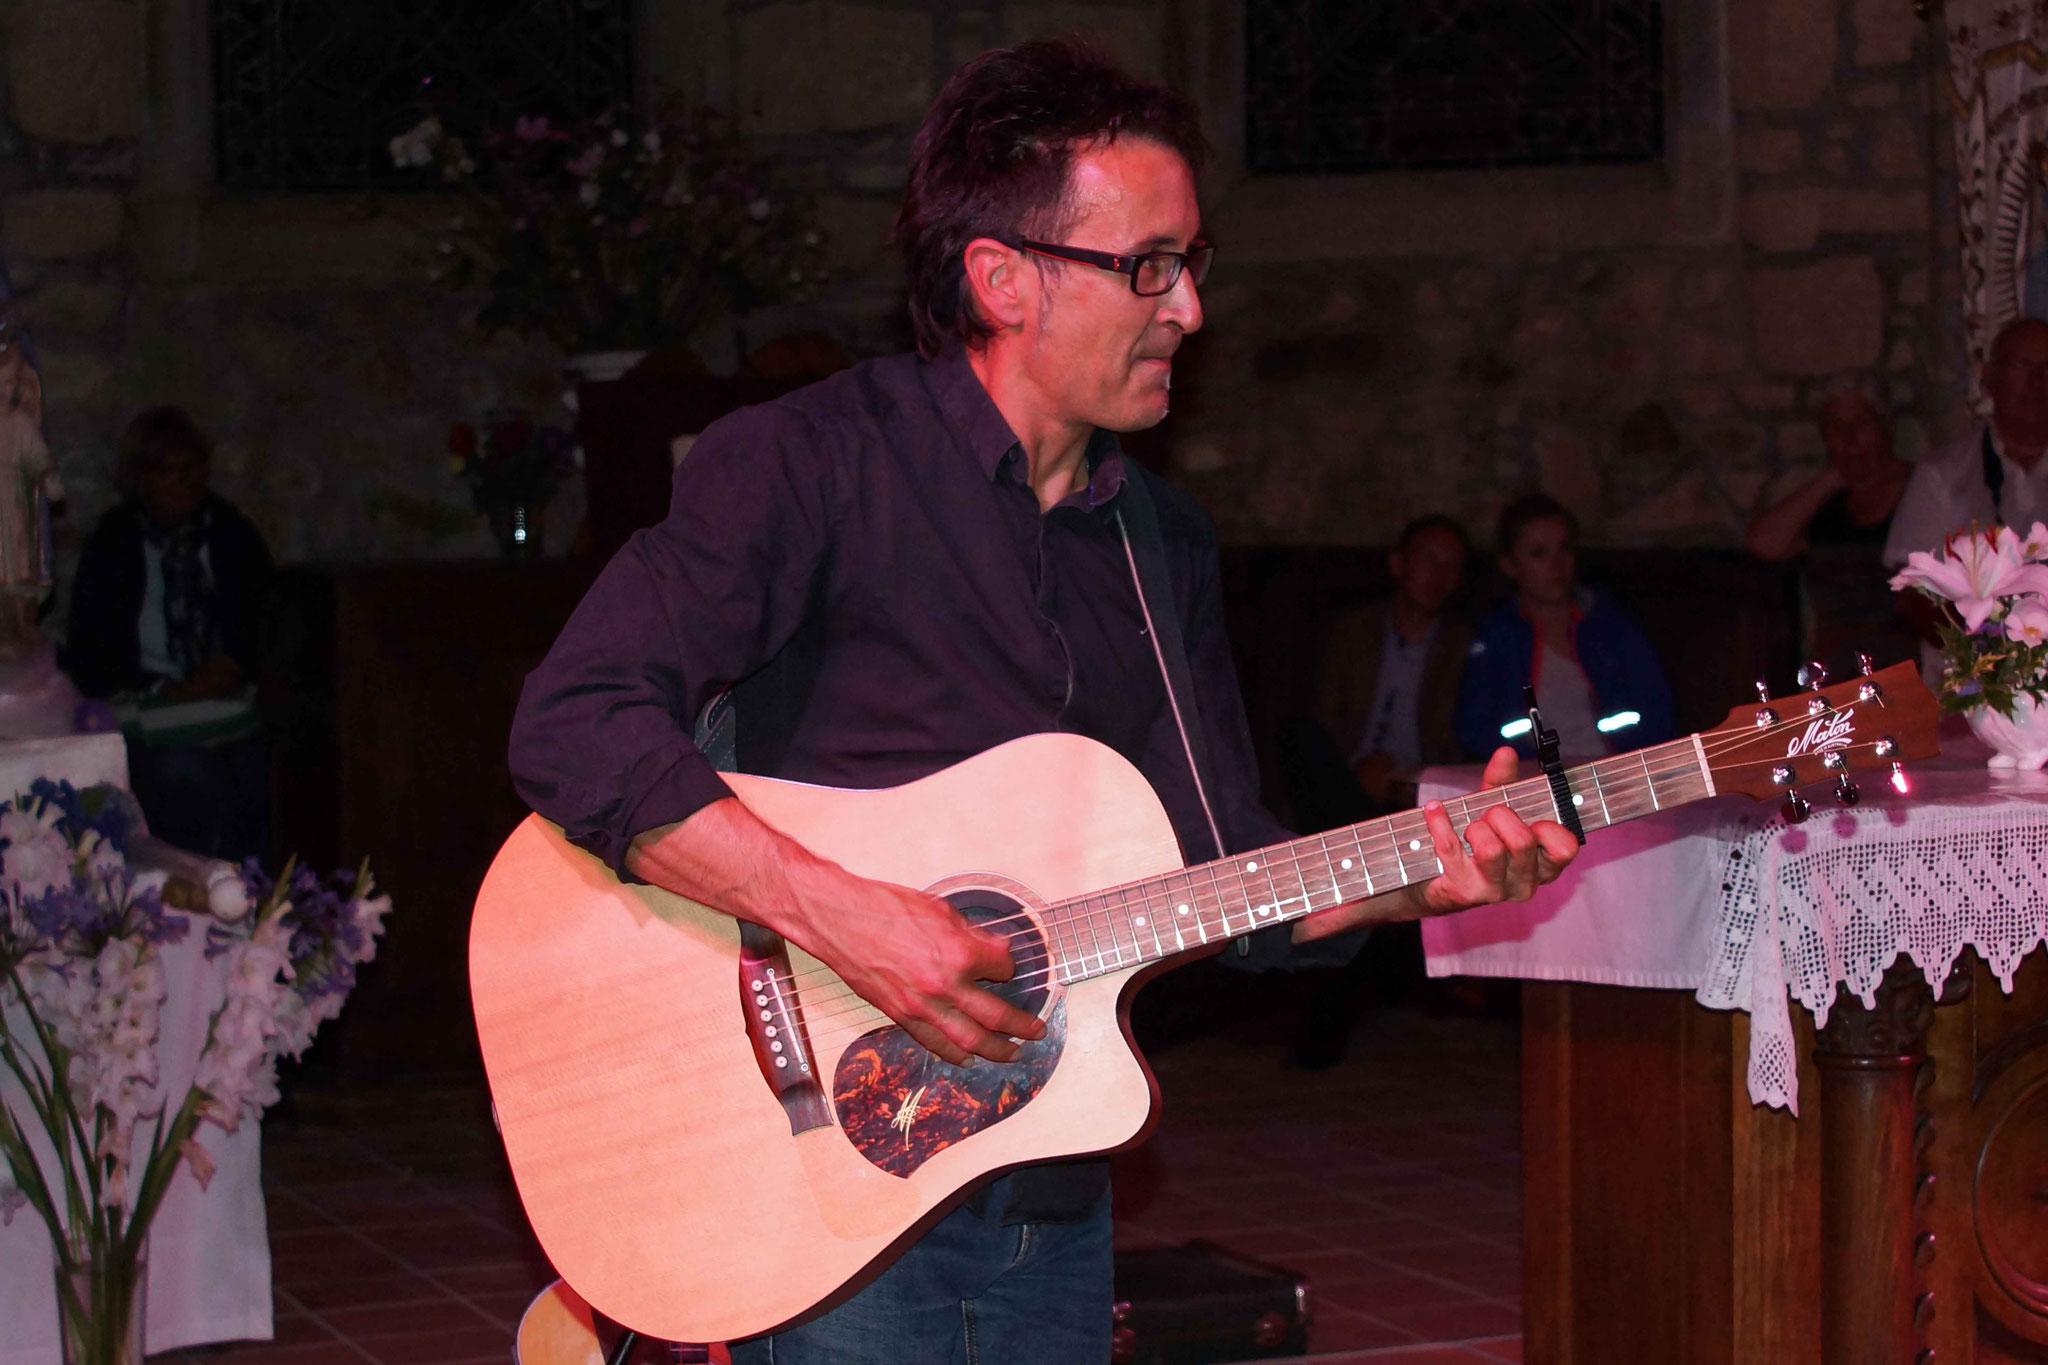 Concert de Kermaria Sulard, 28 août 2016 ; 7